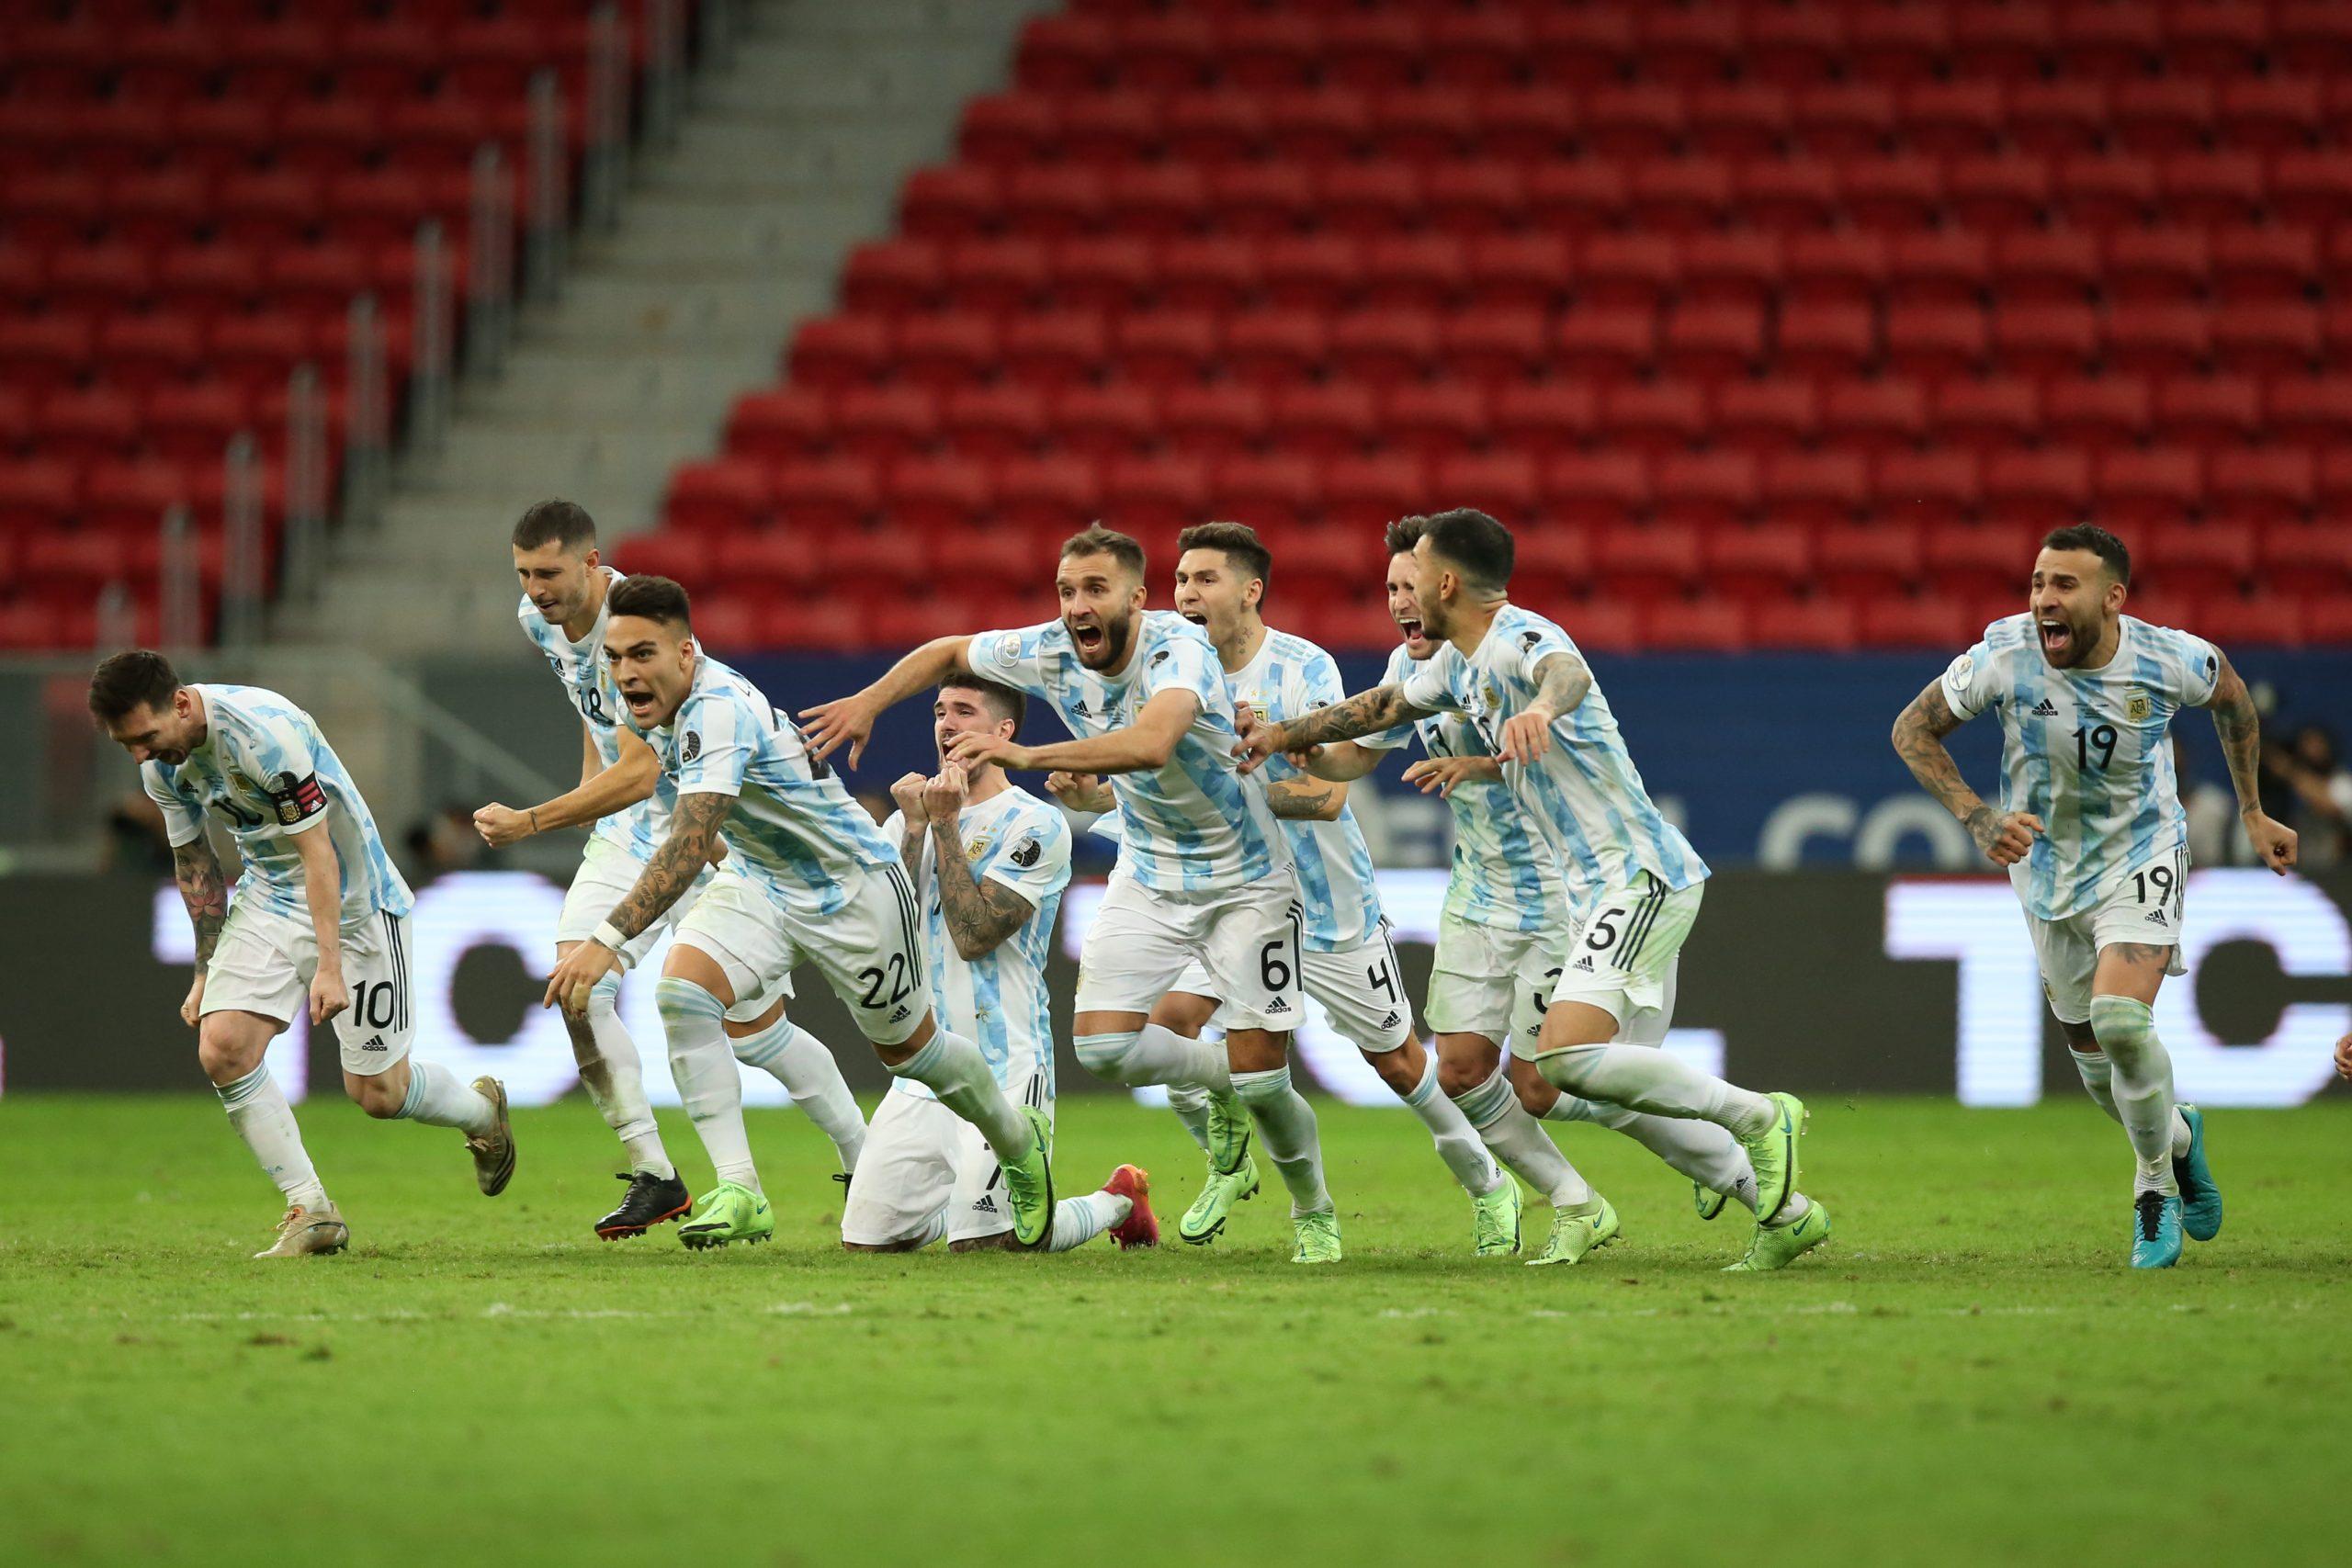 PK戦を制したアルゼンチンが決勝進出【写真:Getty Images】